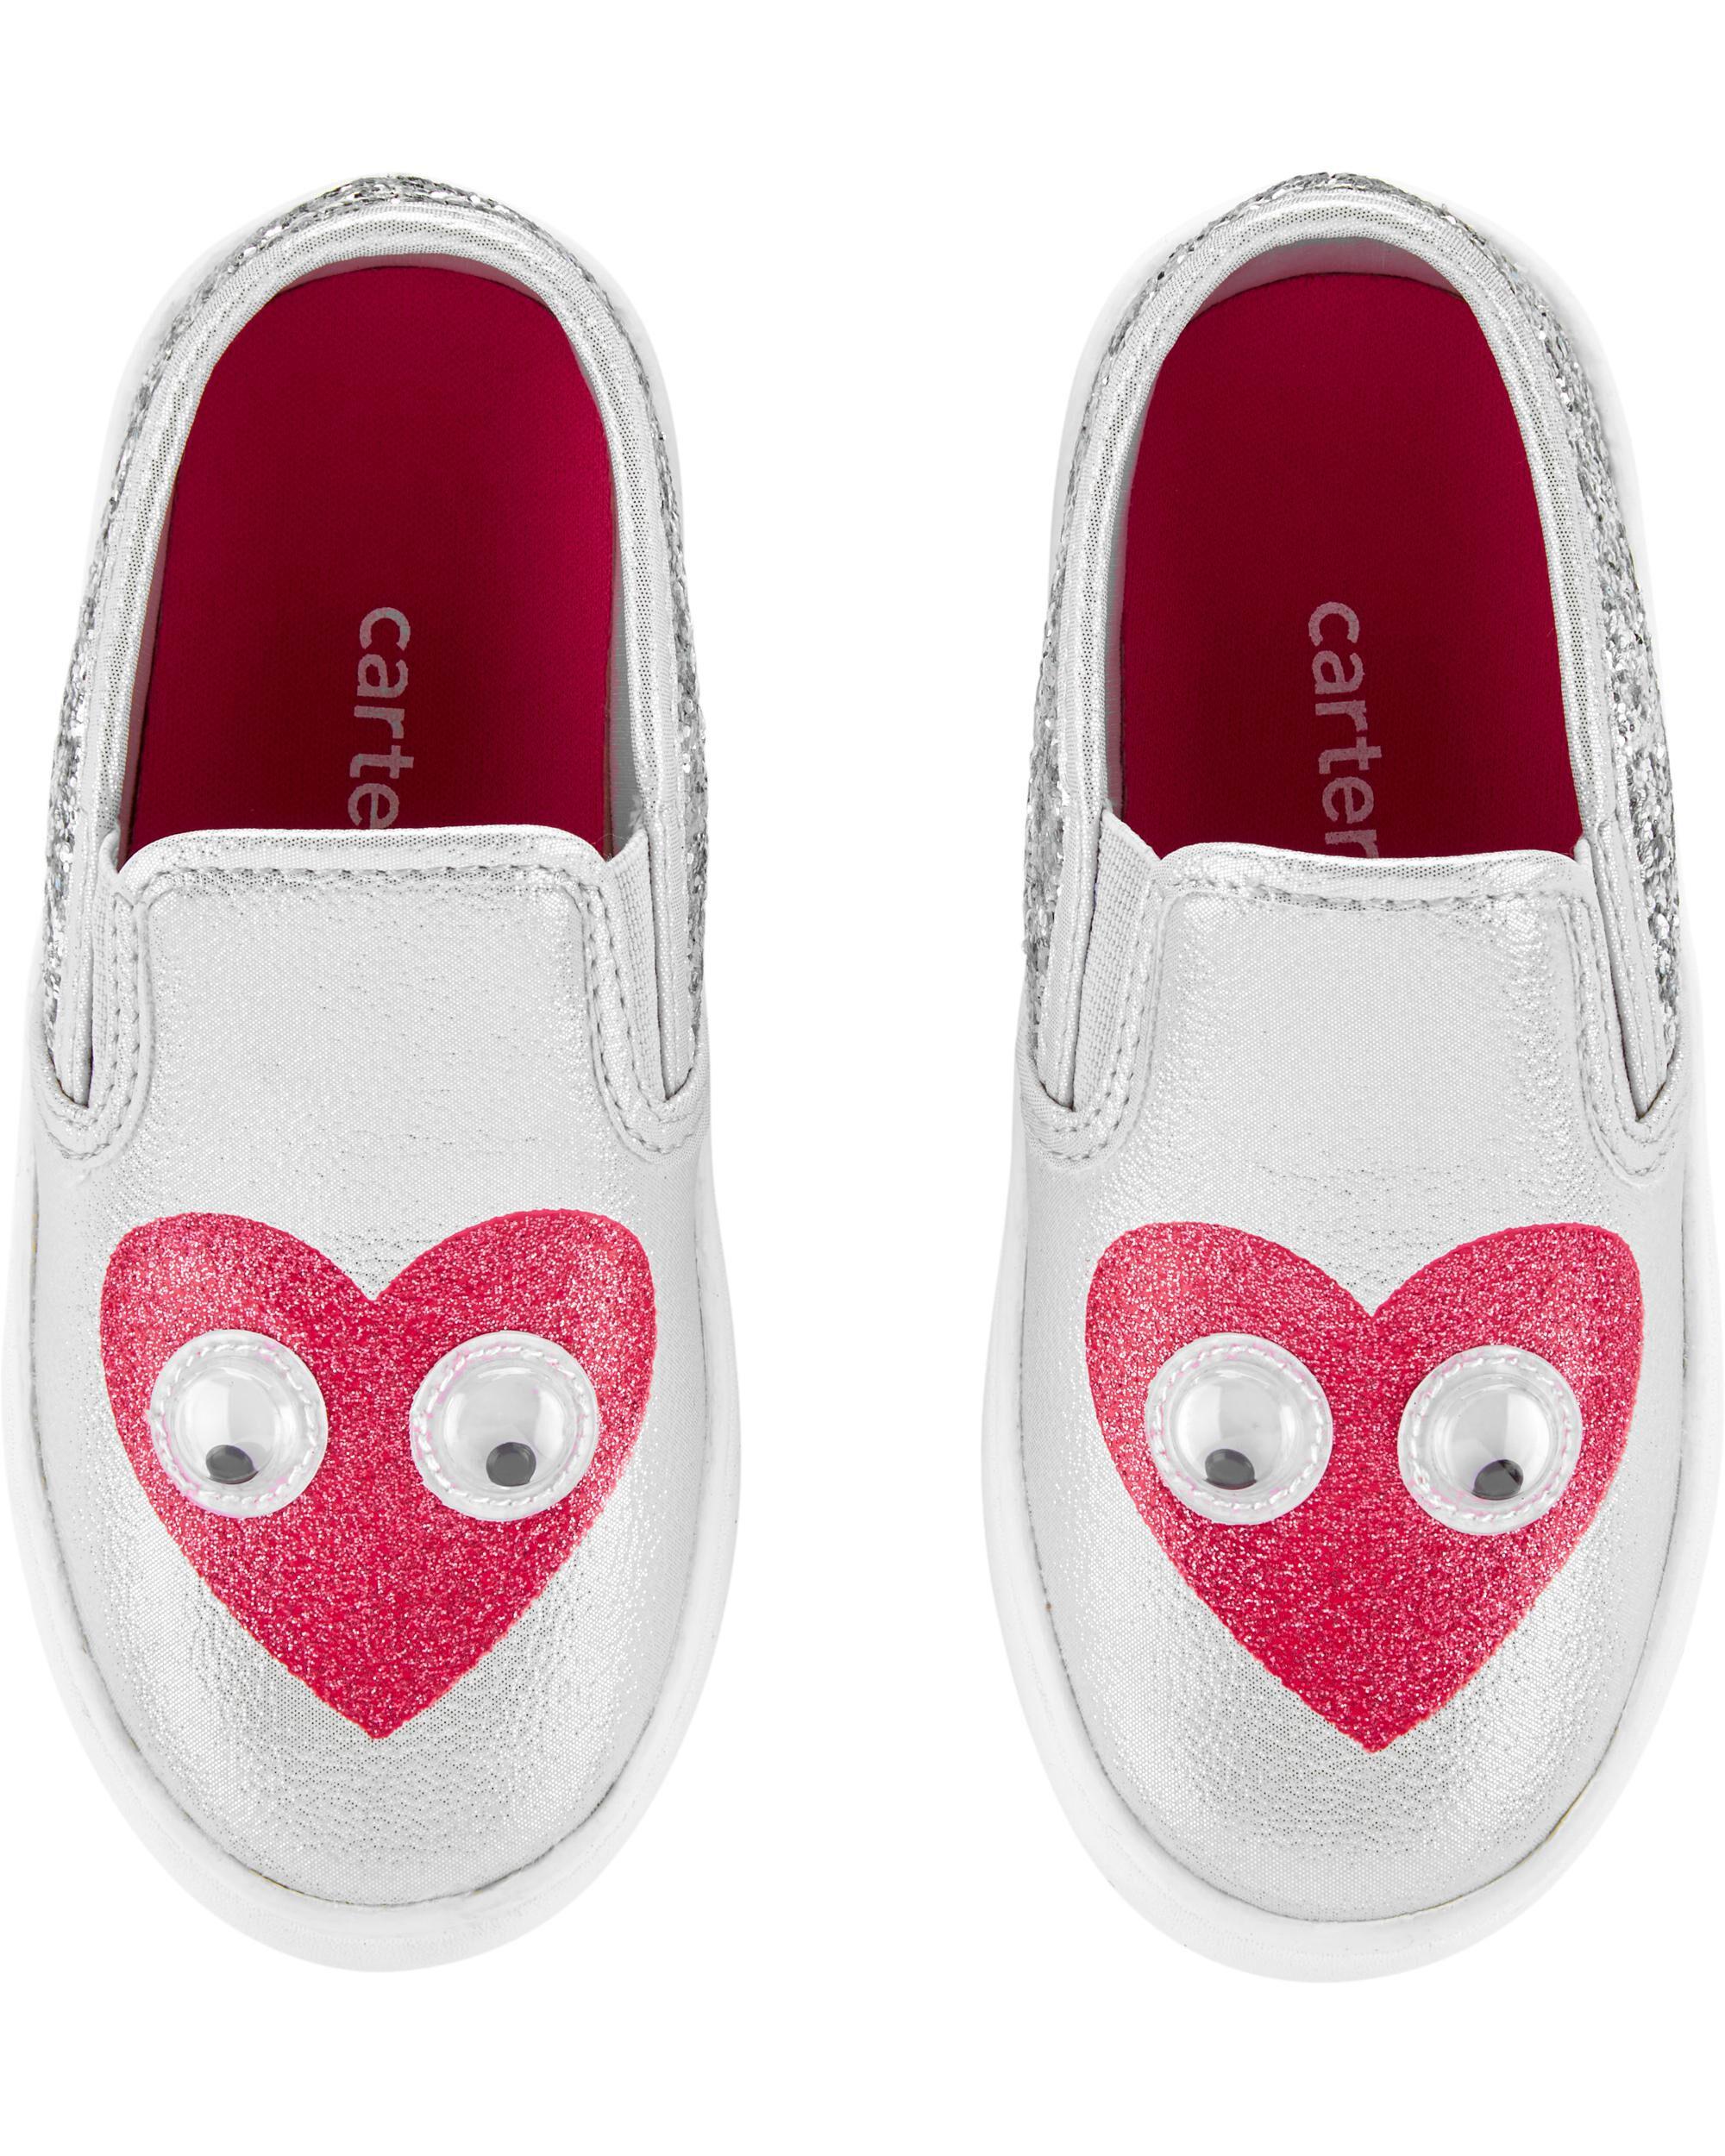 Oshkoshbgosh Carters Casual Sneakers